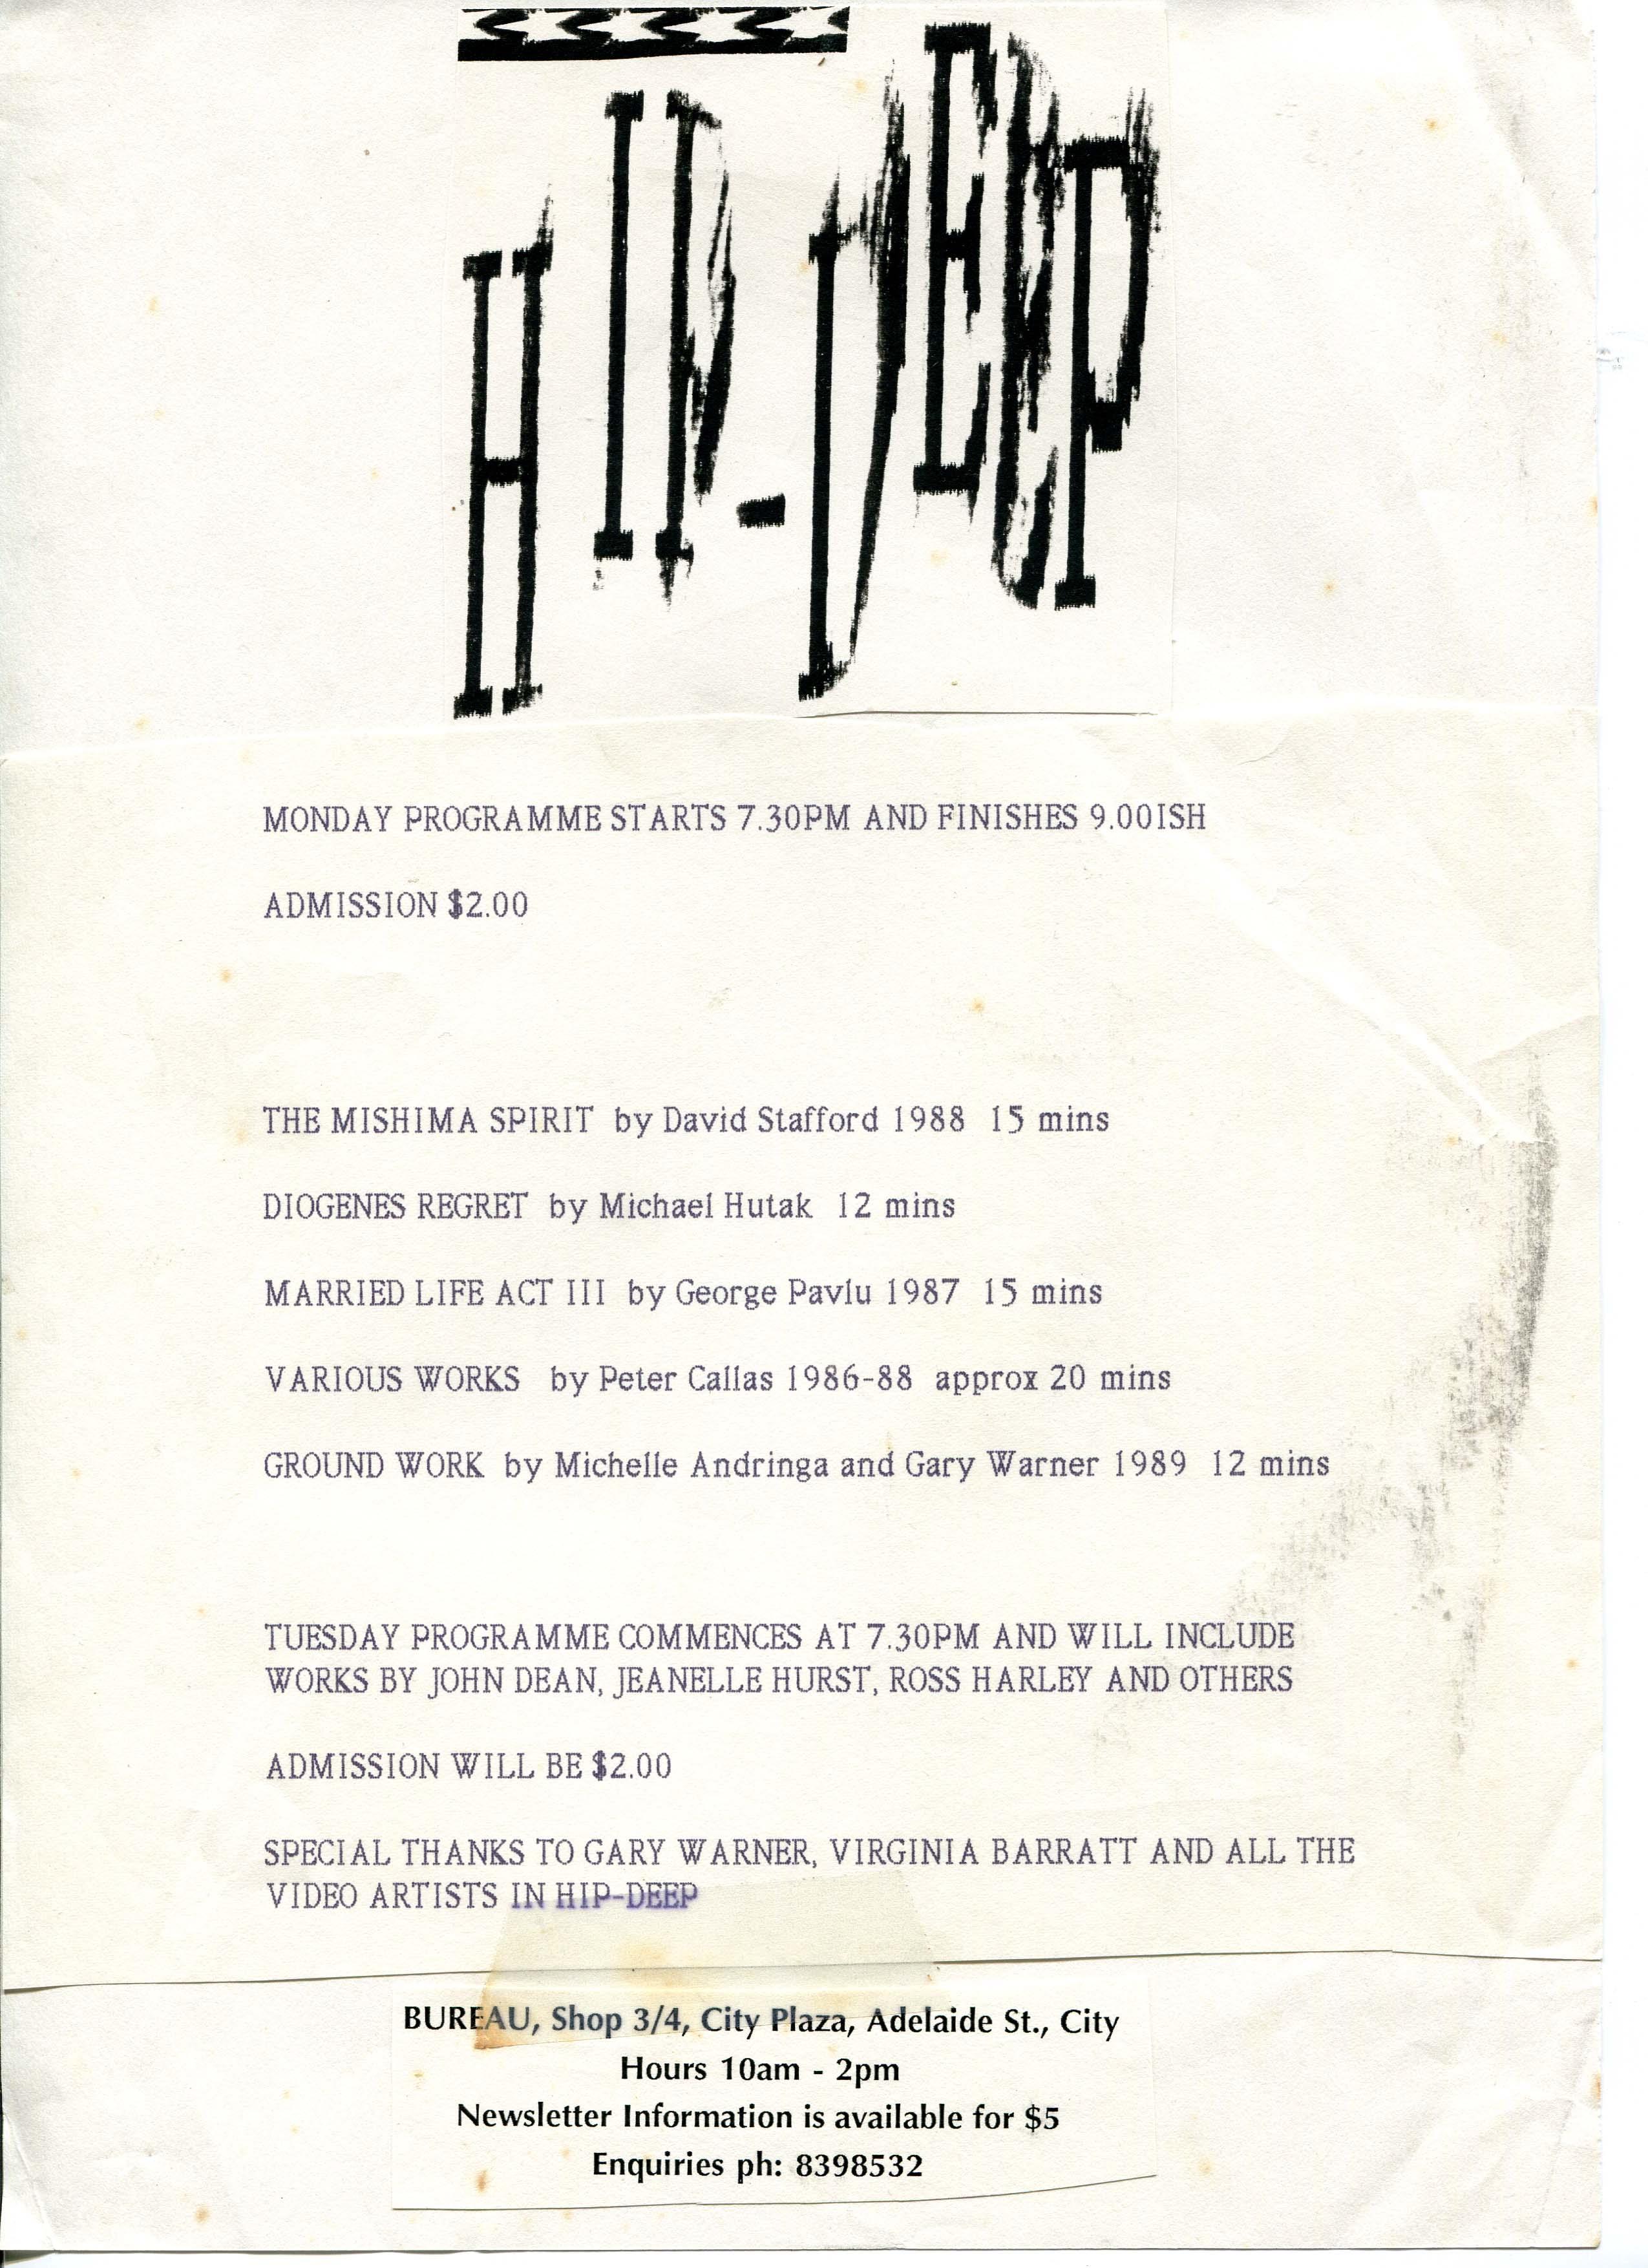 Bureau - Hip Deep Programme - Gary Warner & Paul Andrew